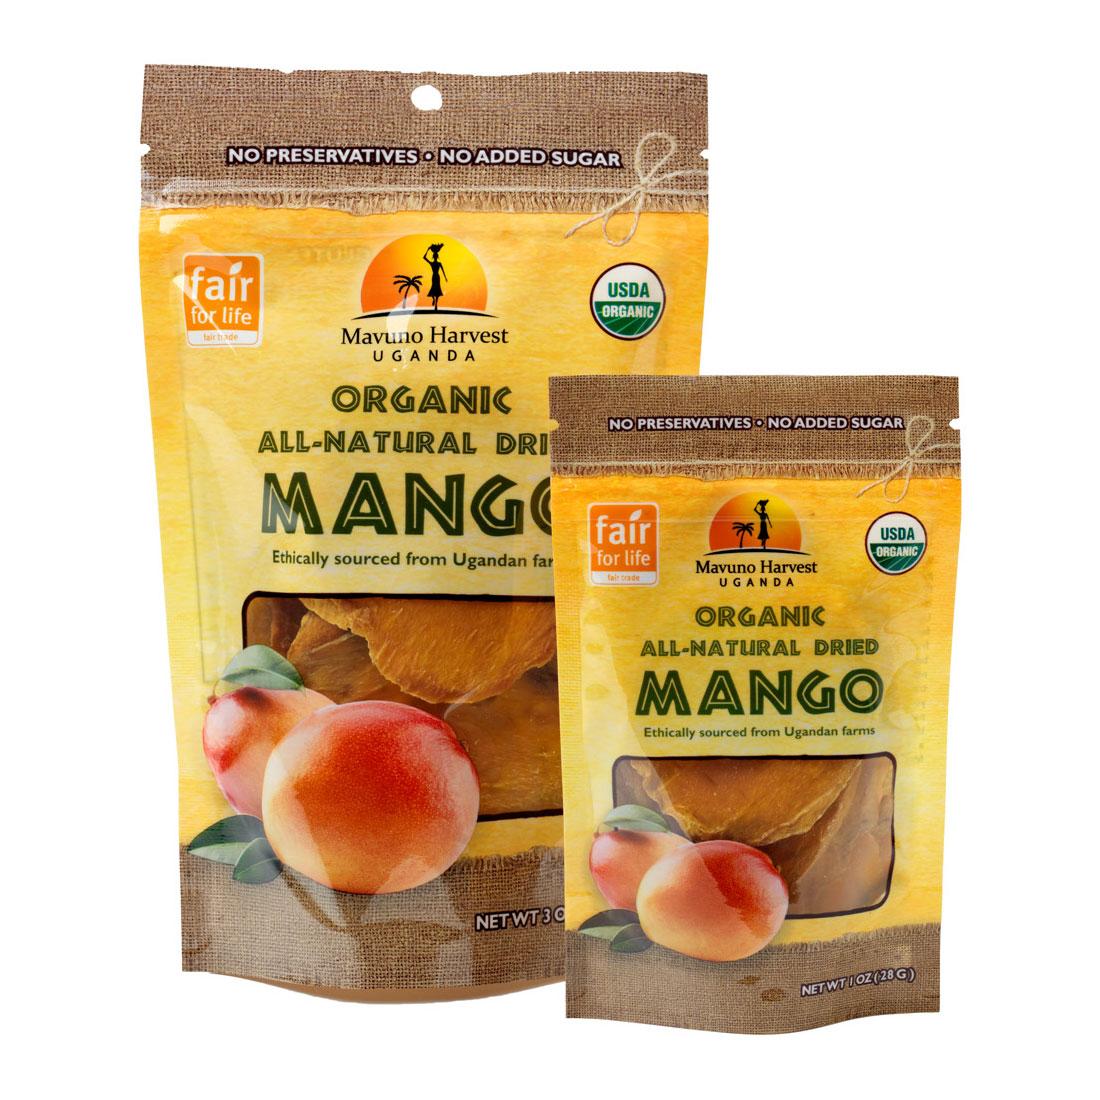 mango-large-and-small